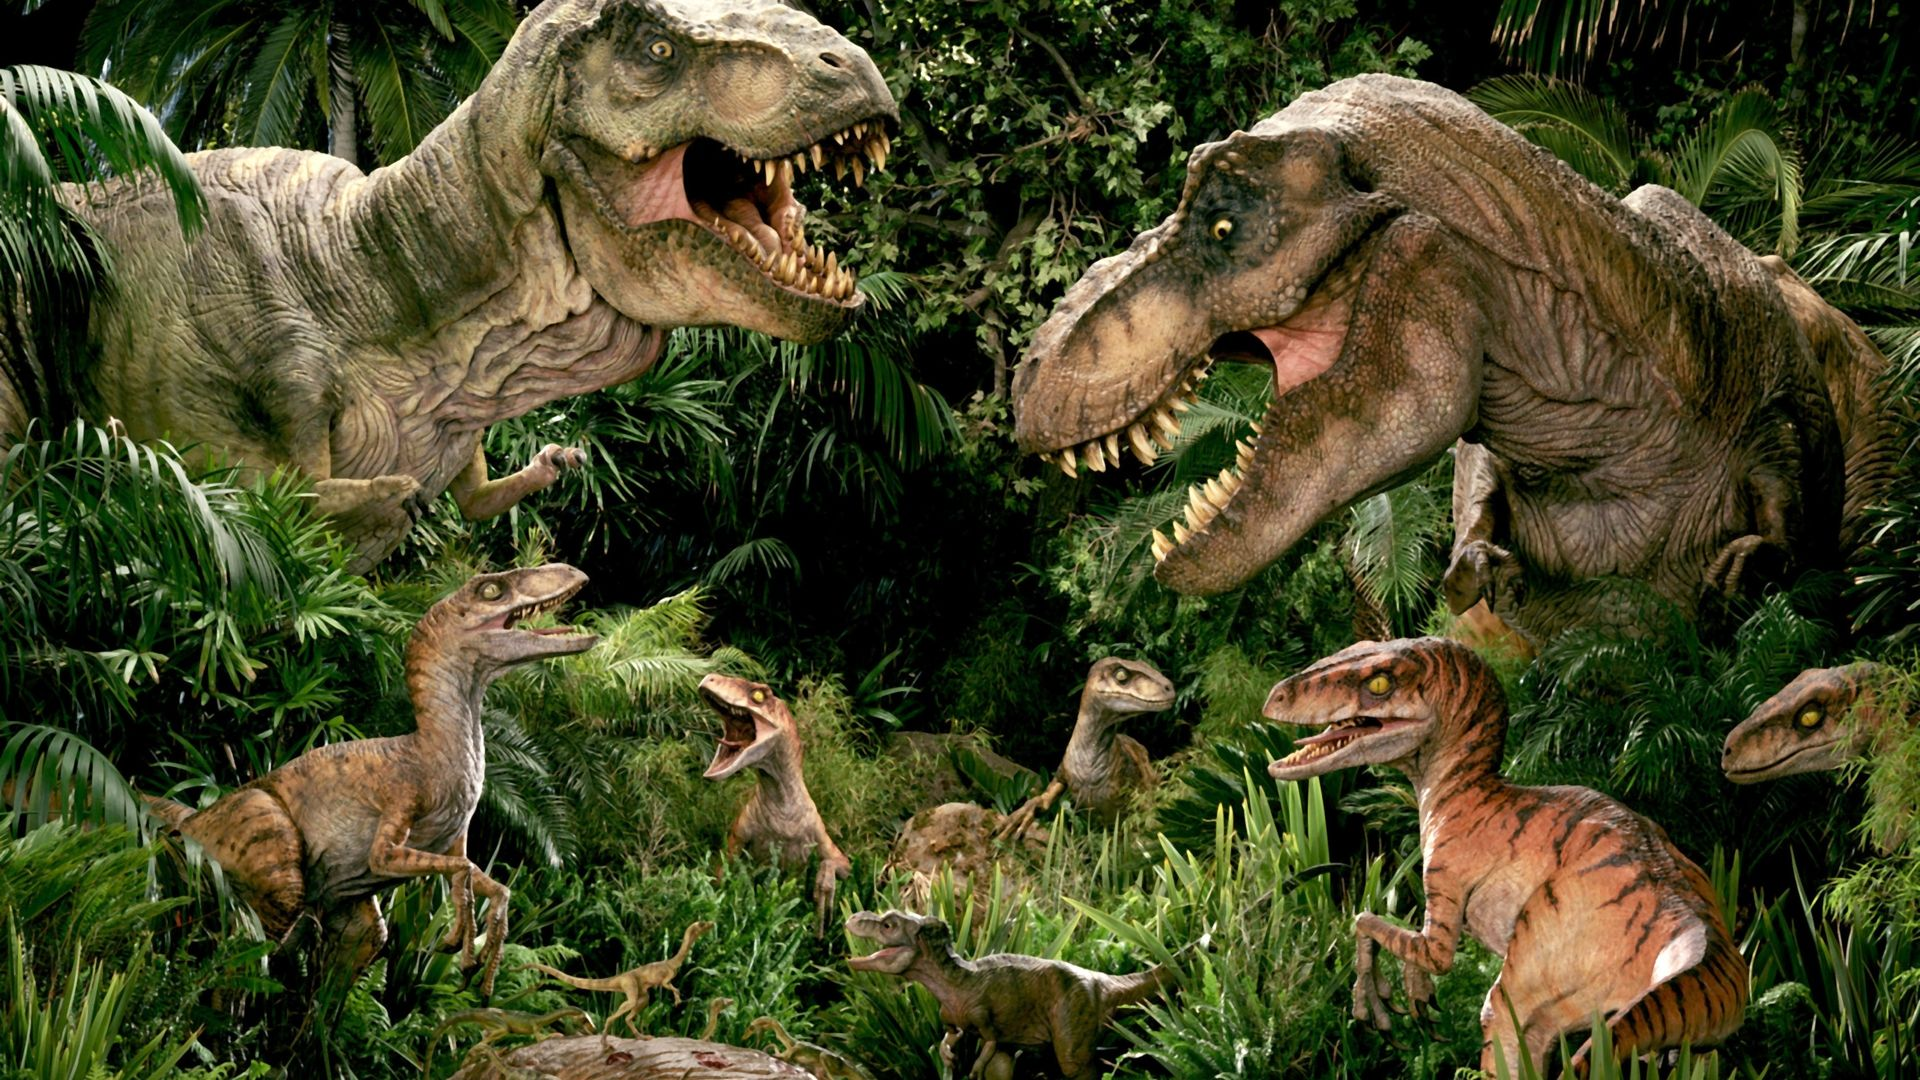 Dinosaur Hd Images 4 Dinosaur Hd Images Pinterest Jurassic